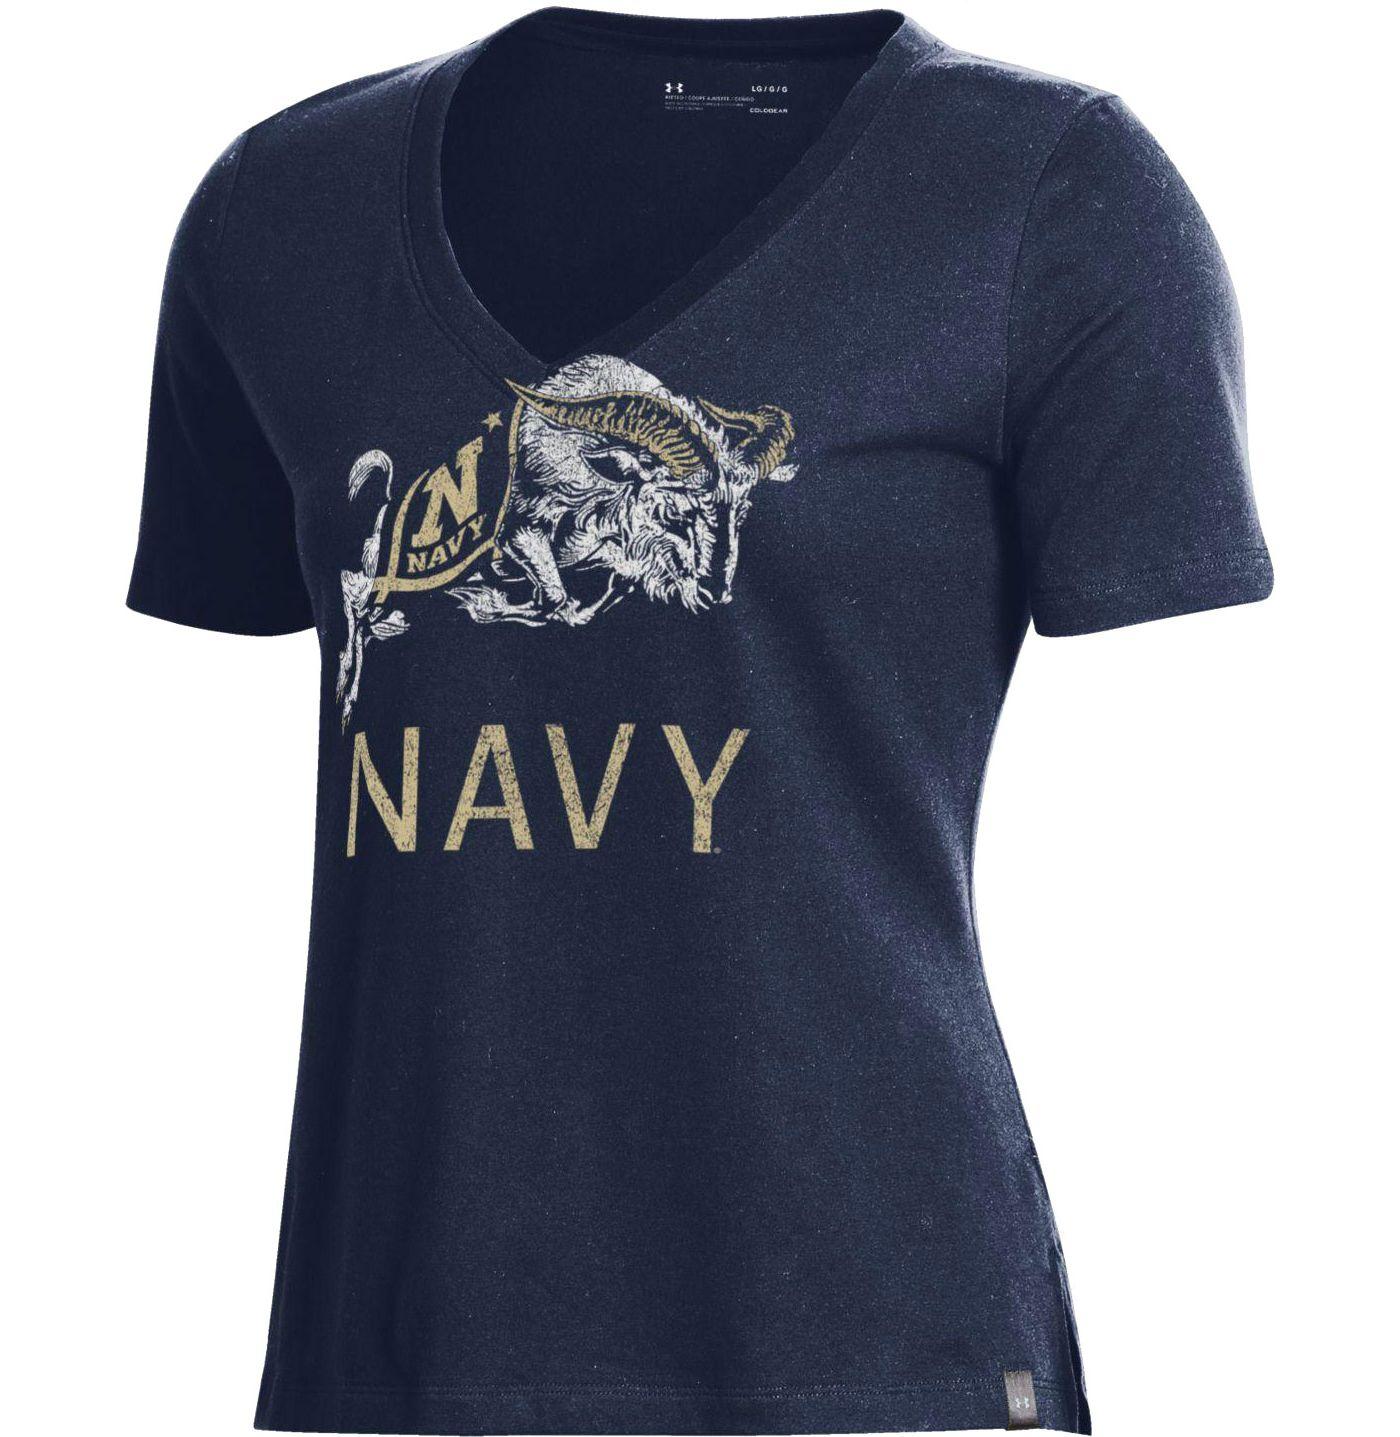 Under Armour Women's Navy Midshipmen Navy Performance V-Neck T-Shirt